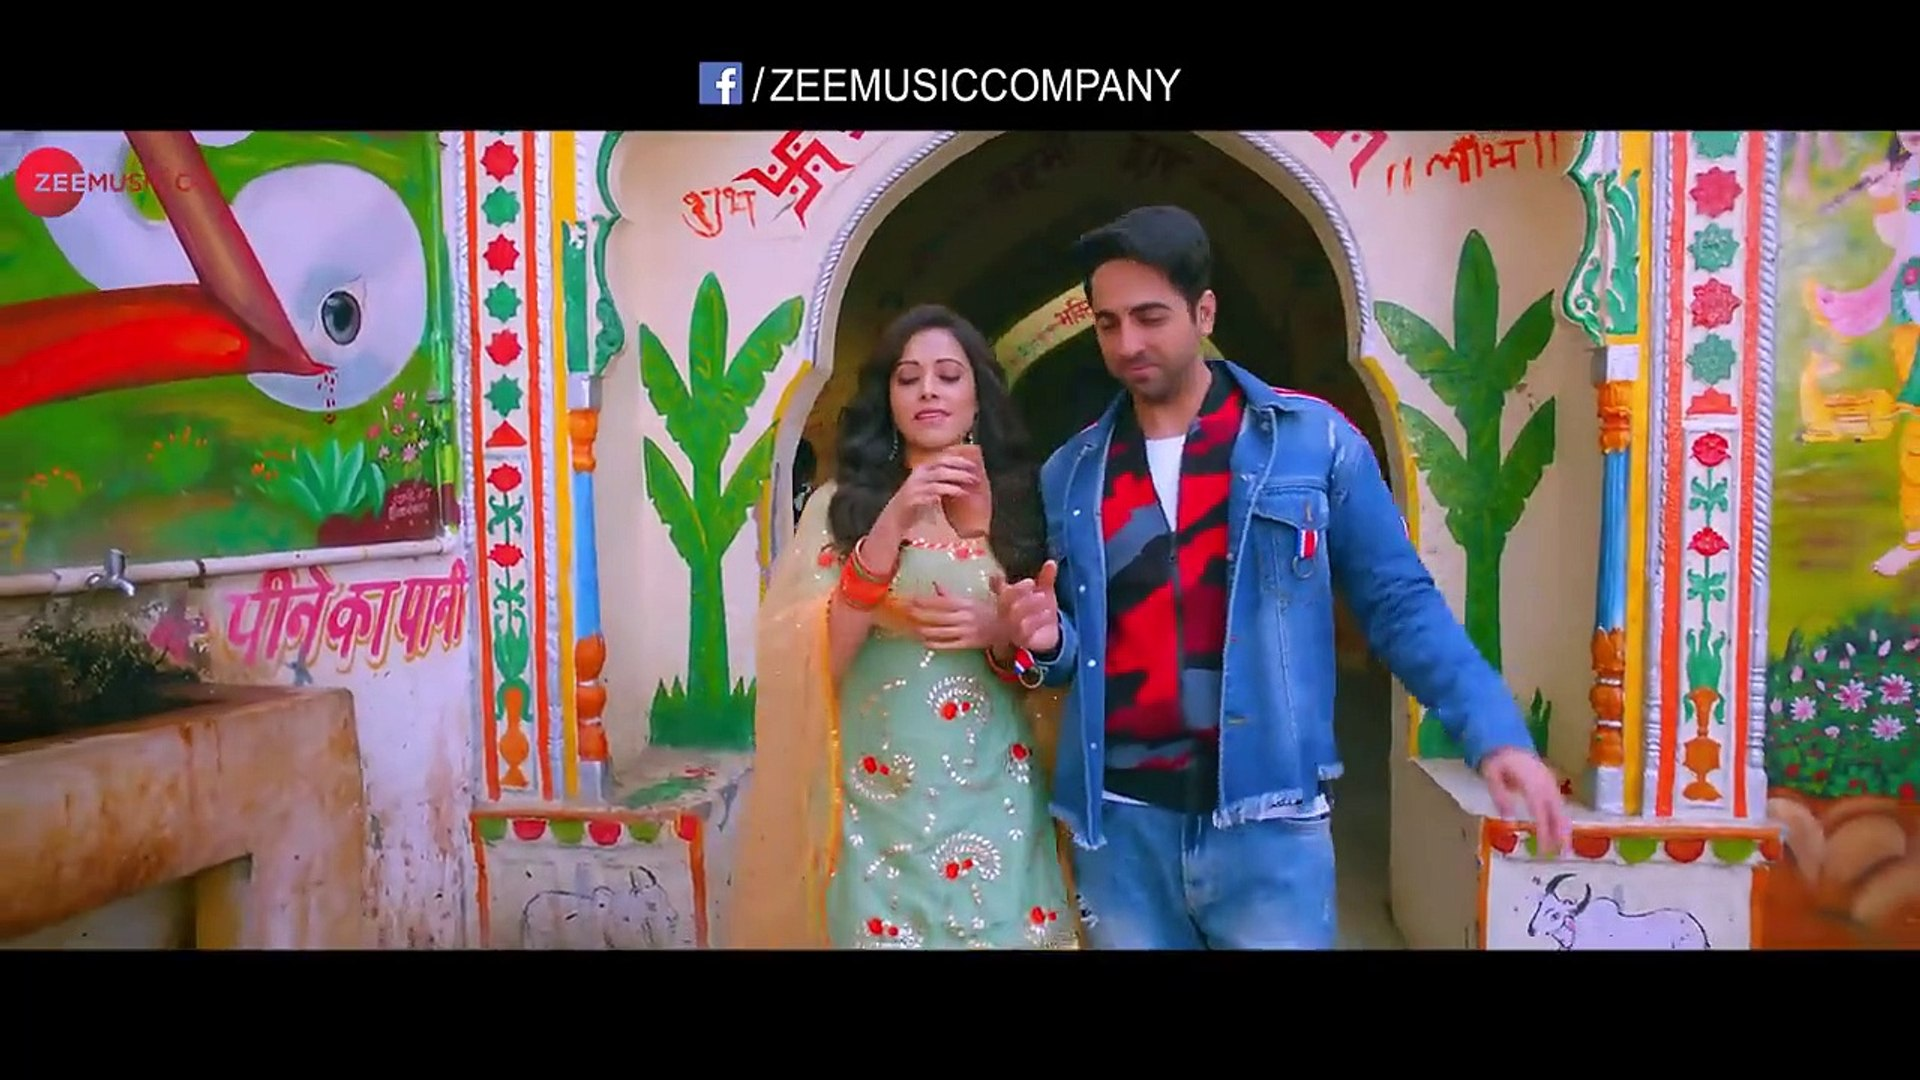 Ik Mulaqaat - Dream Girl - Ayushmann Khurrana, Nushrat Bharucha - Meet Bros Ft. Altamash F & Pal